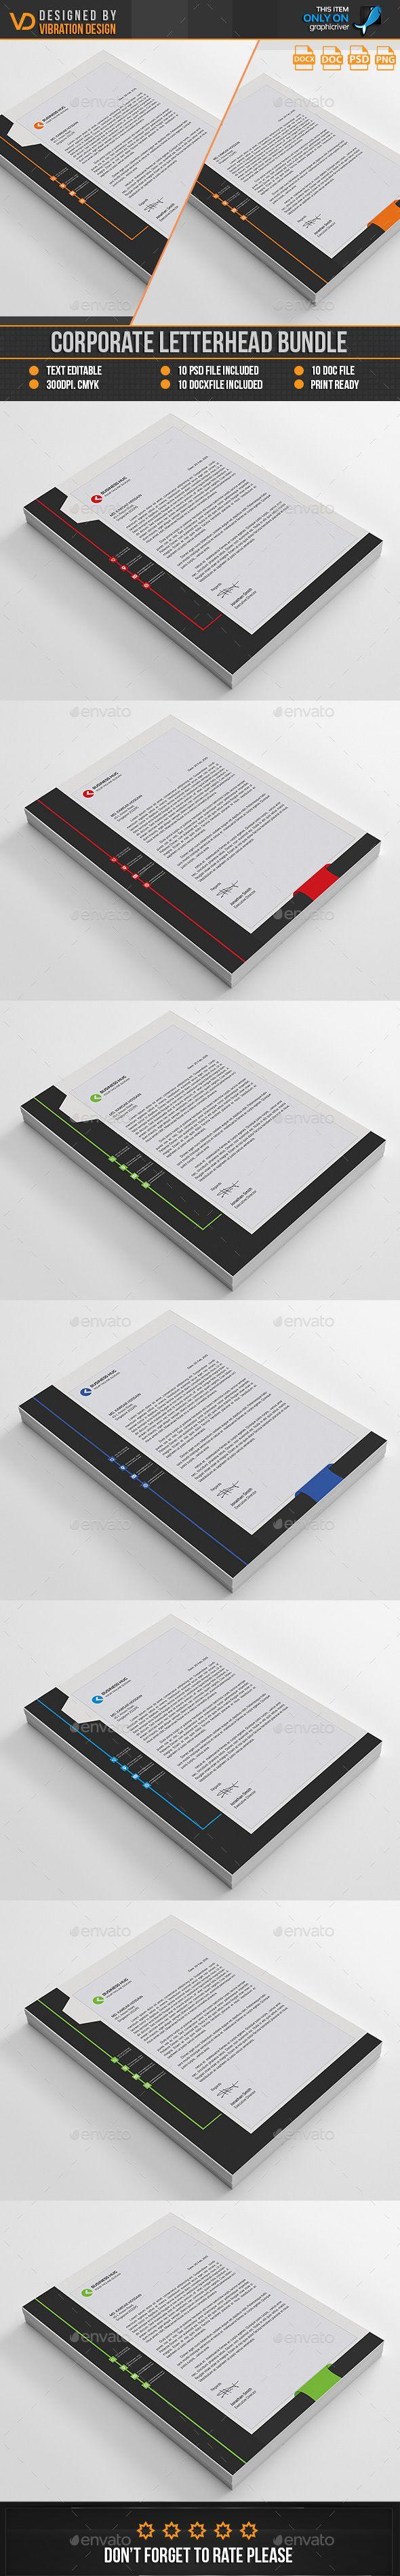 letter format on letterhead%0A Corporate Letterhead Bundle by kawsarnshimo